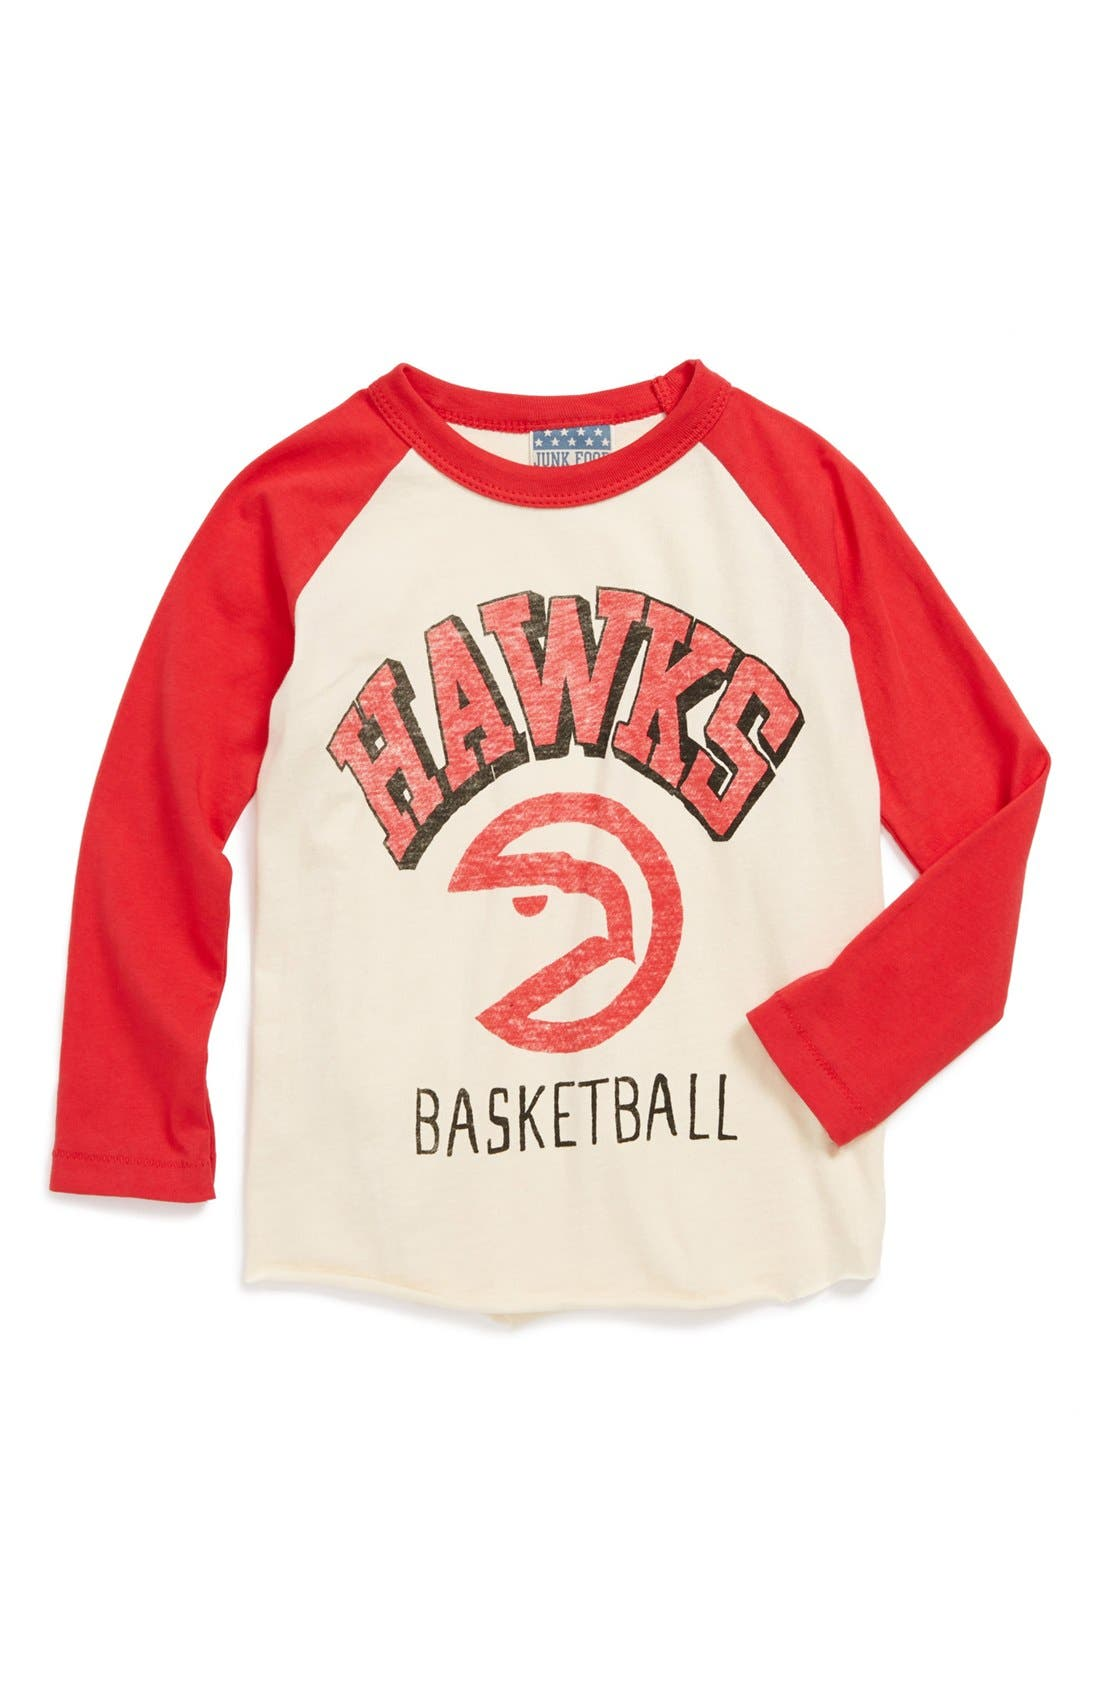 Alternate Image 1 Selected - Junk Food 'Atlanta Hawks' Long Sleeve T-Shirt (Little Boys & Big Boys)